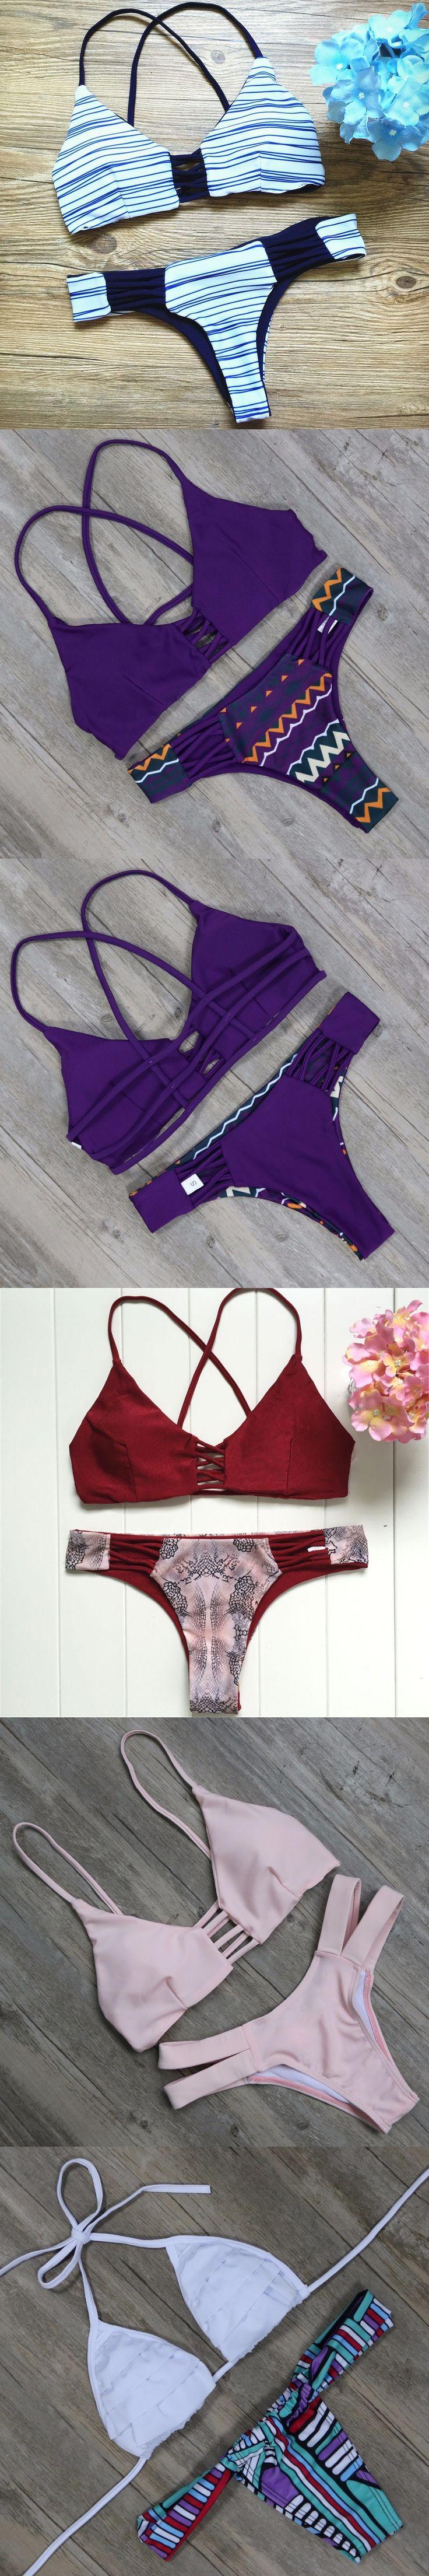 S - L Size Brazilian Bikinis Set Women Swimwear 2016 Bandage Biquinis Brazil Bikini Retro Swimsuit Blue Bathing Suit E687 $26.18